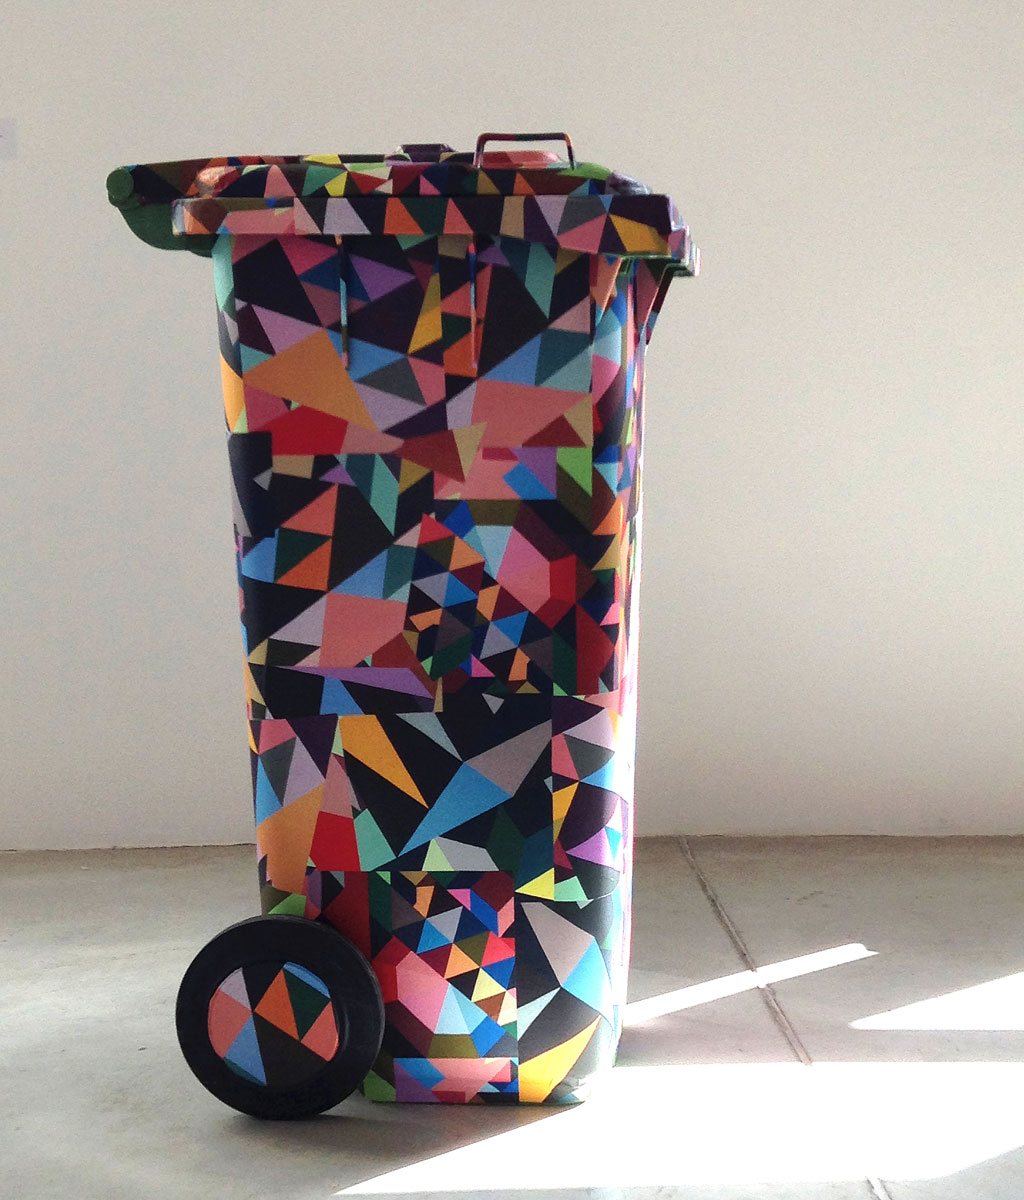 c-finley-wall-papered-dumpster-vienna.jpg